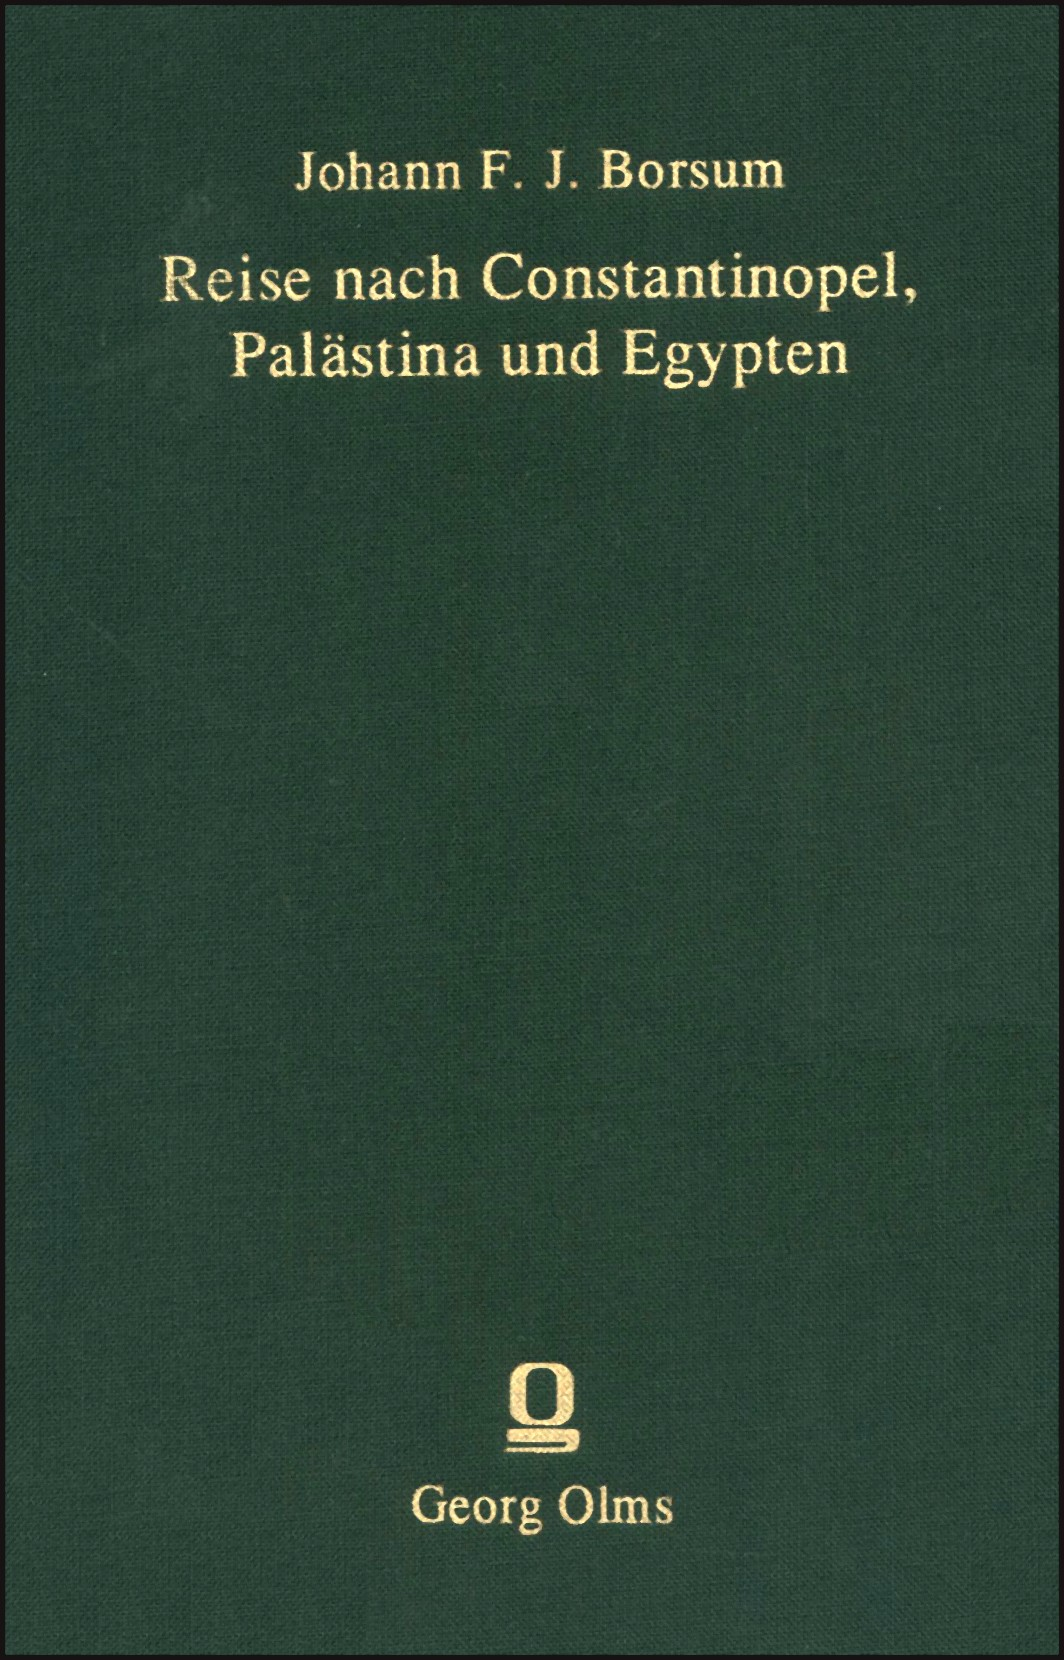 Reise nach Constantinopel, Palästina und Egypten | Borsum | Berlin 1825. Reprint: Hildesheim 2005., 2005 | Buch (Cover)